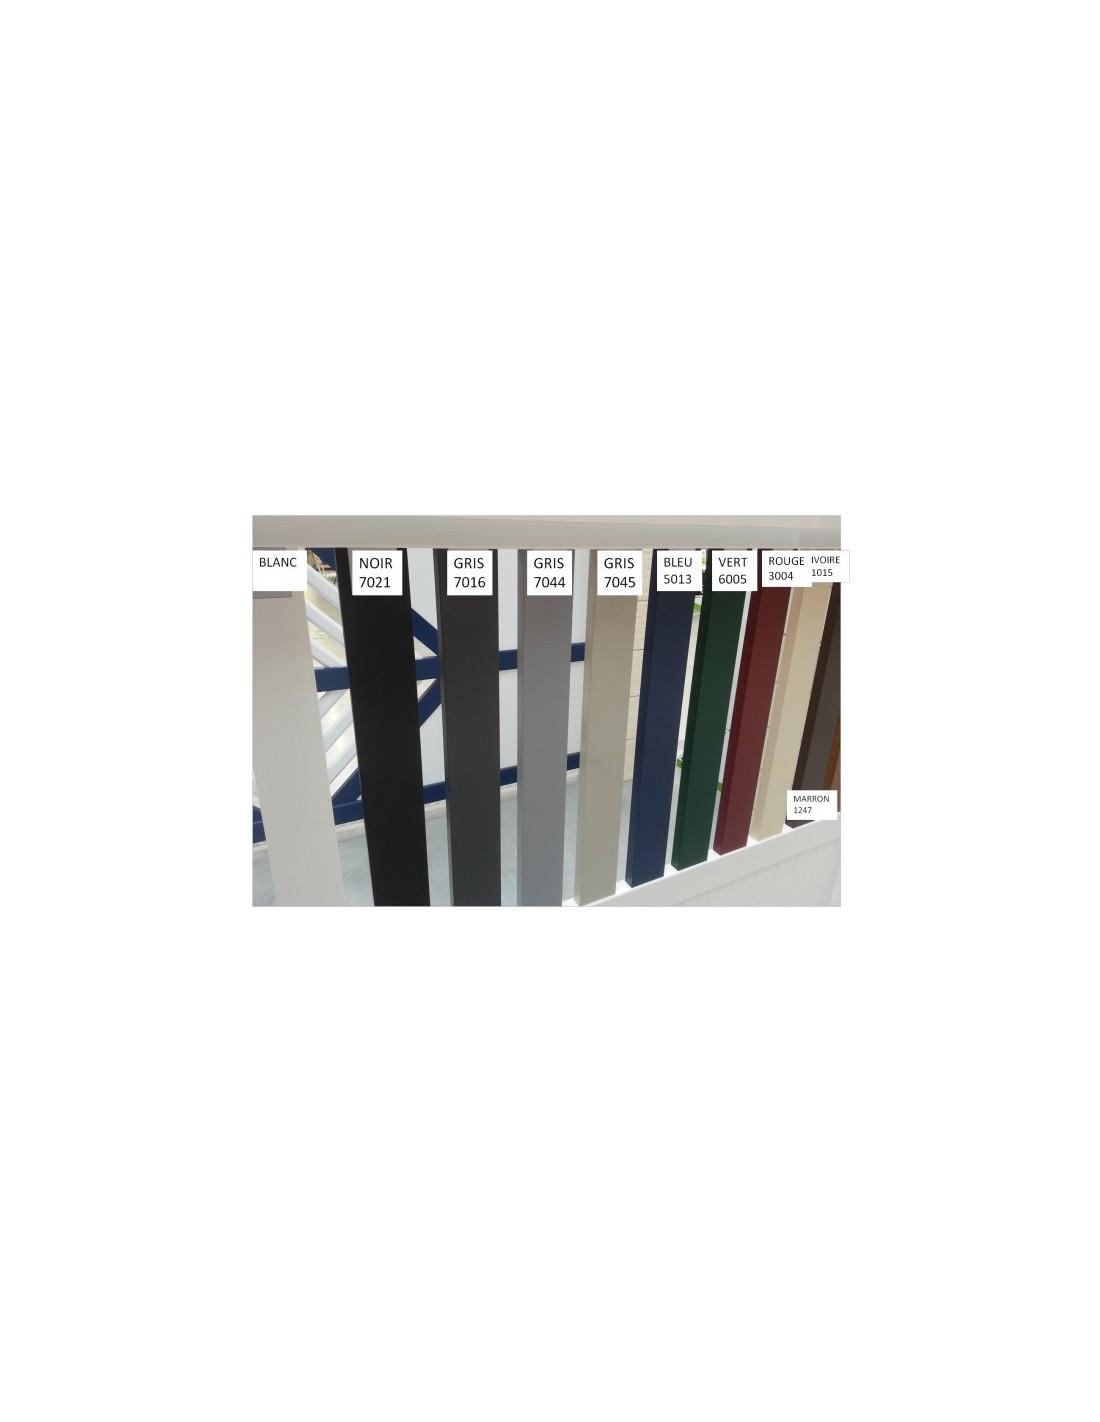 Portail aluminium ouvrant la fran aise cap ferret design contemporain sur mesure 3m50 4m for Portail aluminium sur mesure